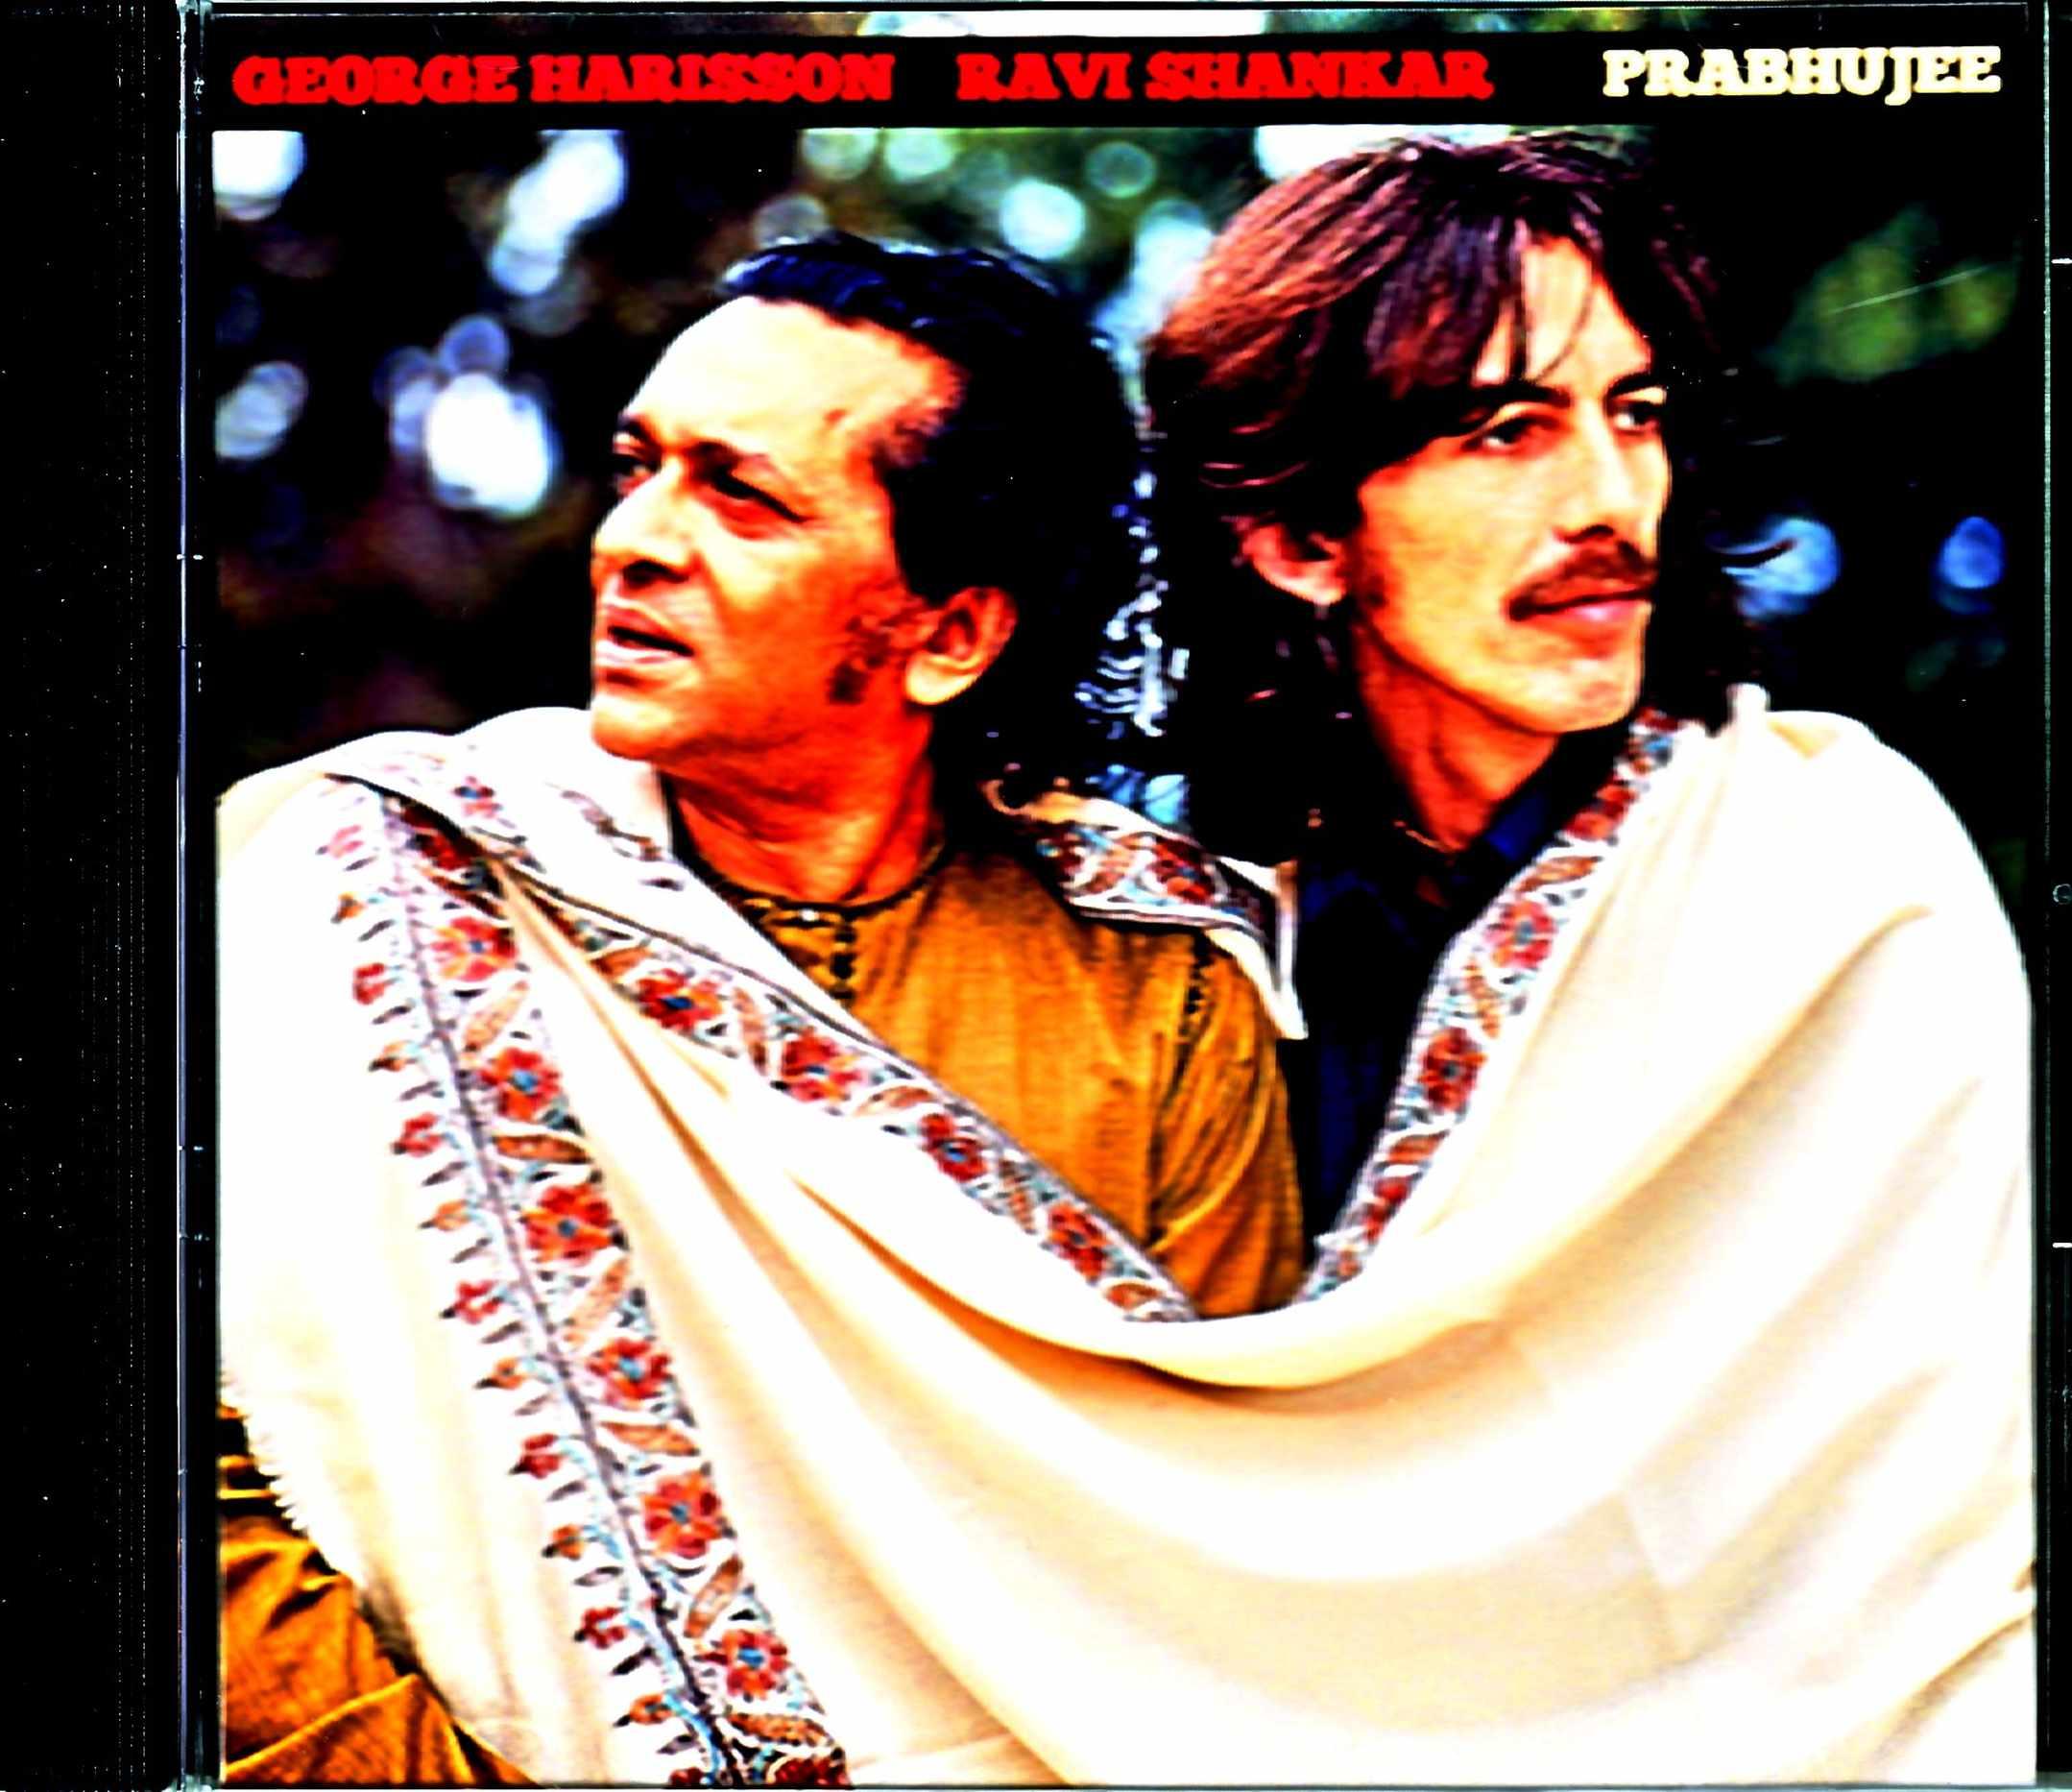 George Harrison Ravi Shankar ジョージ・ハリソン/Various Studio and TV Sources